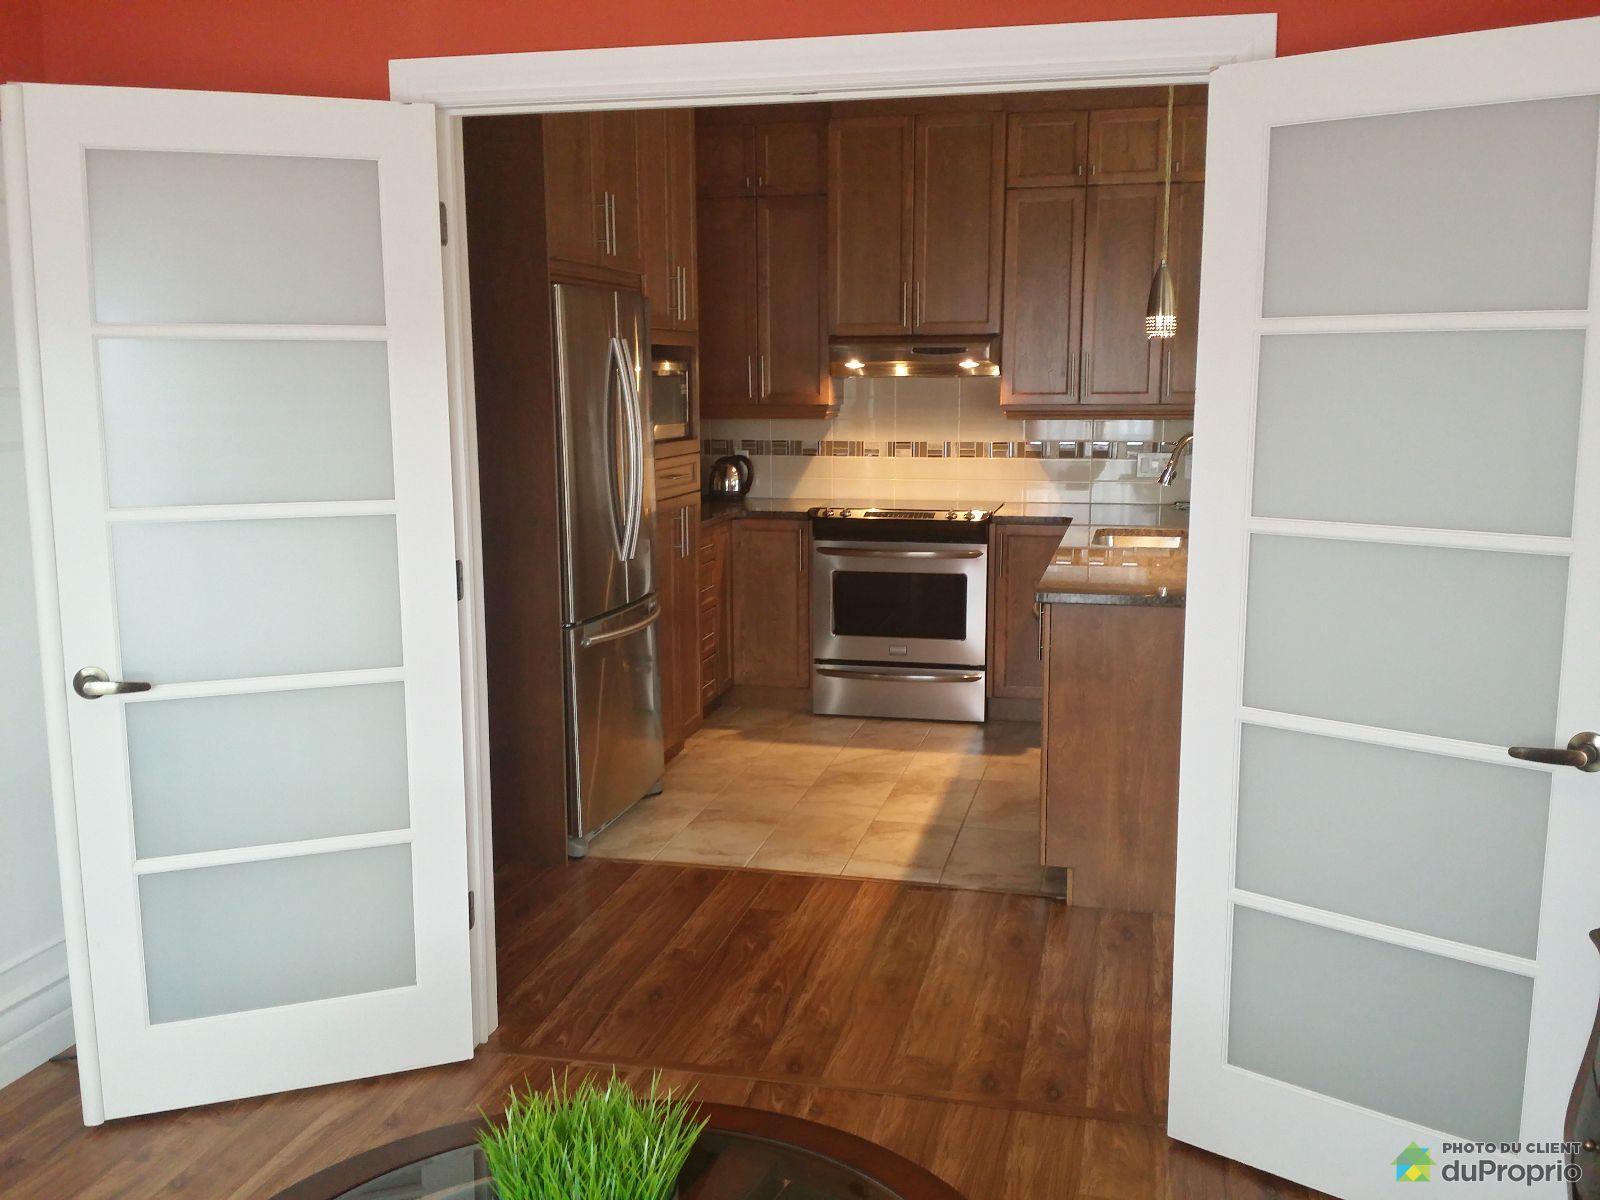 condo vendu sherbrooke immobilier qu bec duproprio 619979. Black Bedroom Furniture Sets. Home Design Ideas